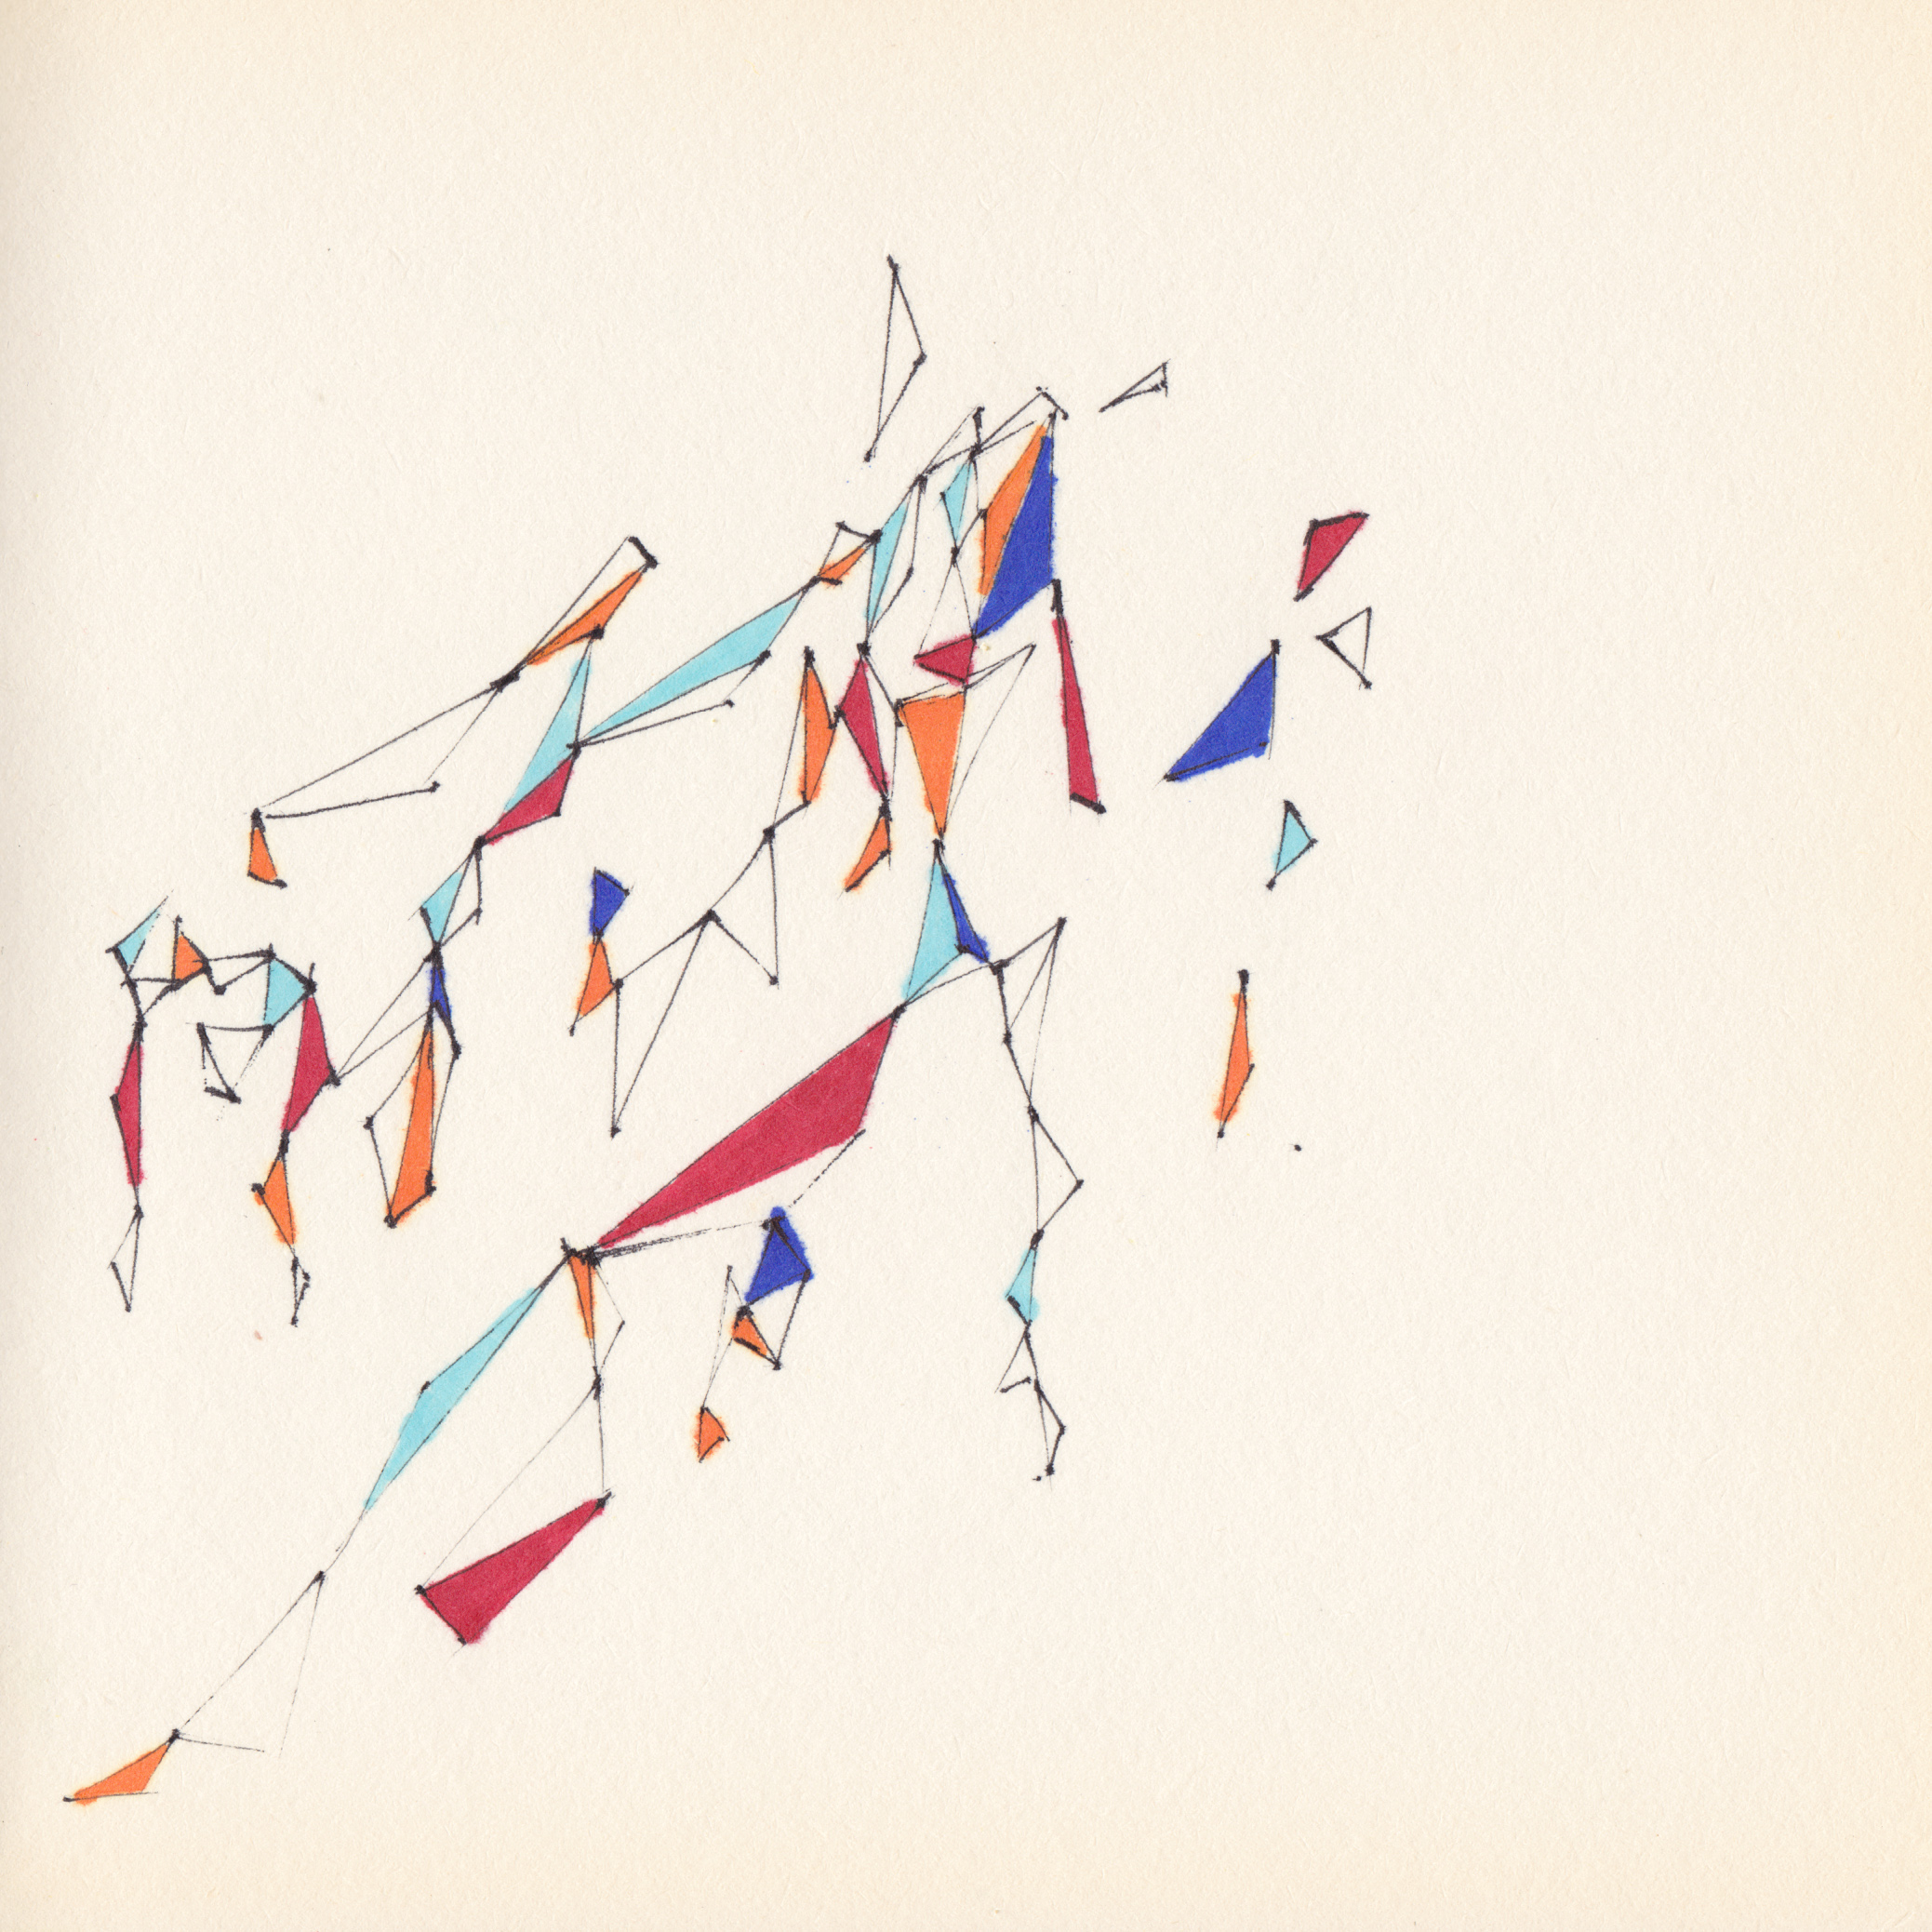 JEREMY RUMAS ART + PEN and MARKER SKETCHES 09 + abstract futurism + modern art +www.jeremyrumas.com.jpeg